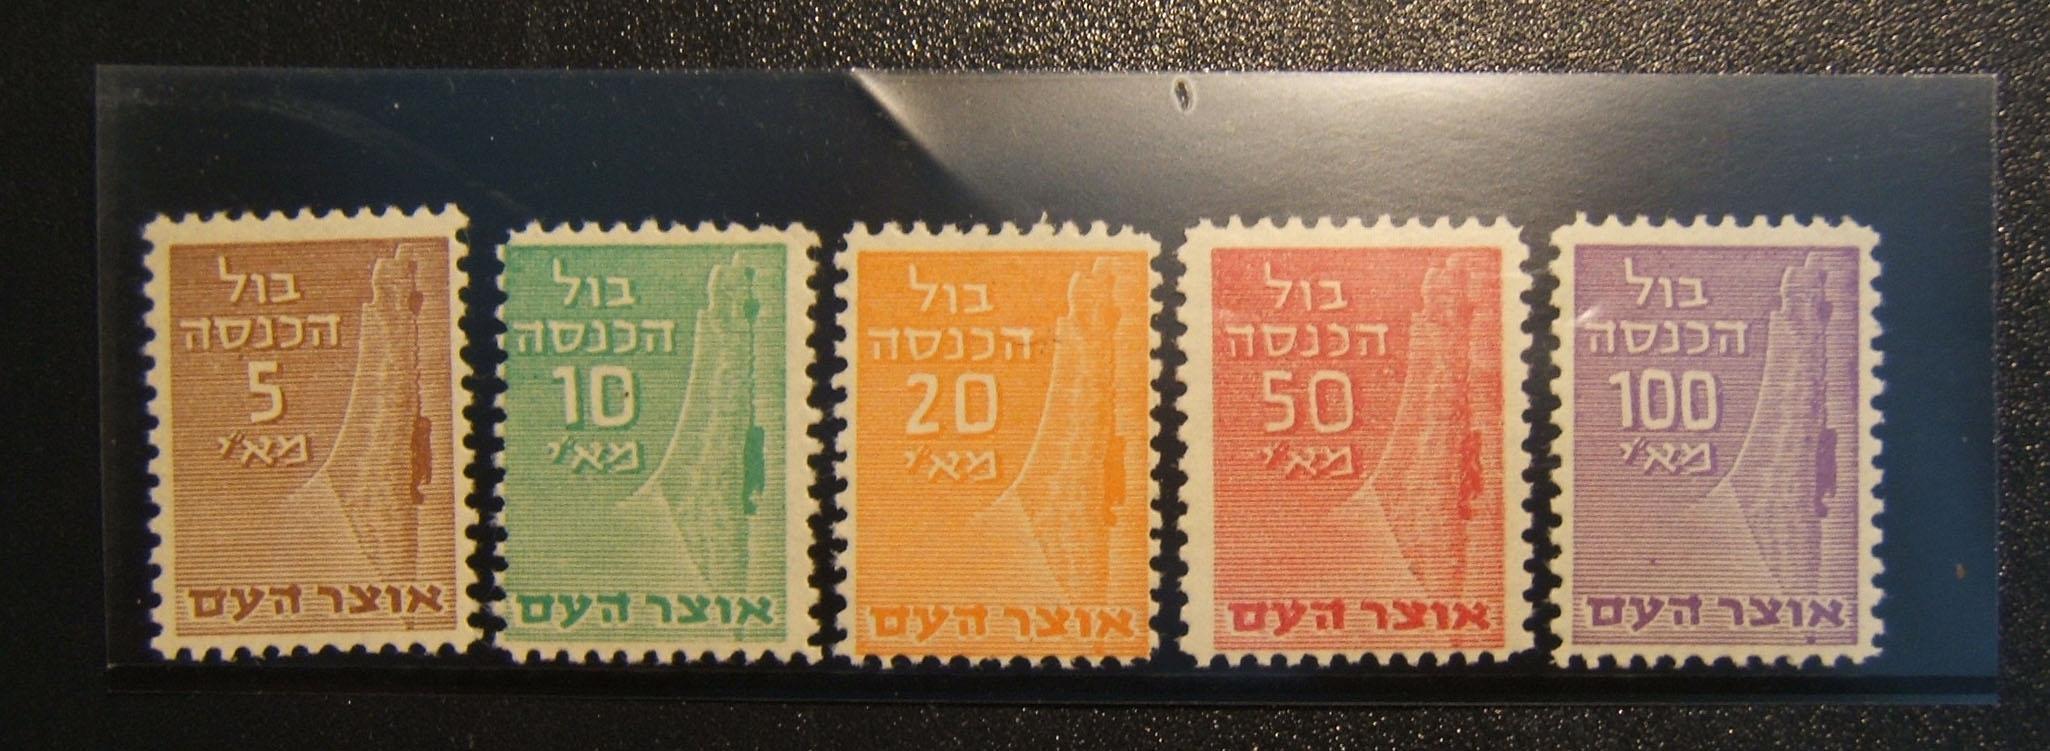 'Otzar Haam' Jerusalem seige rev stps (1948, Ba 1-5) cpl set MNH